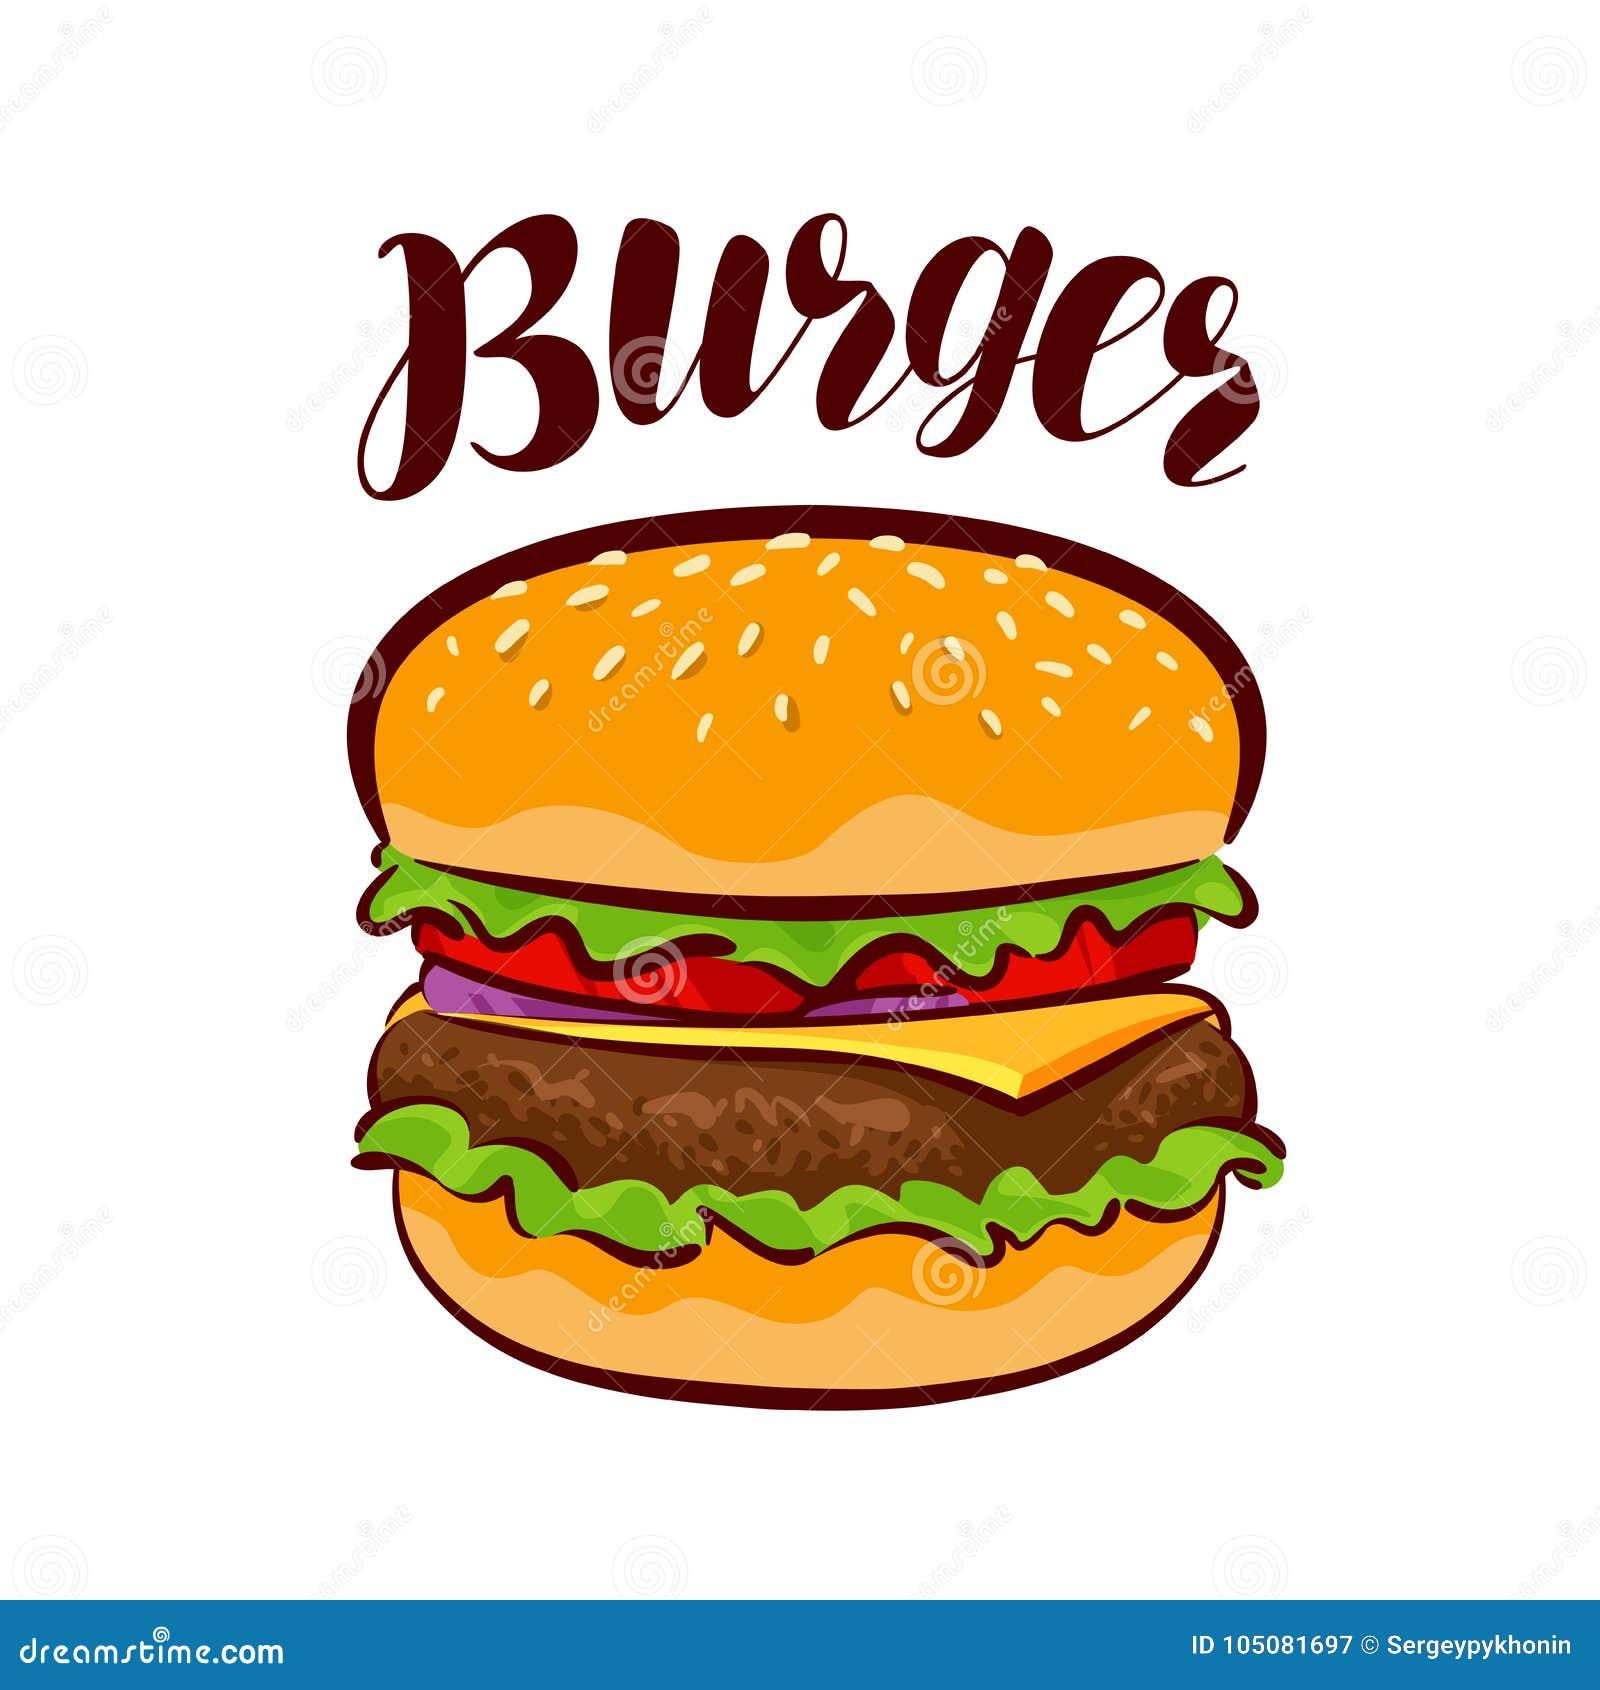 burger, american fast food. element for design menu restaurant or